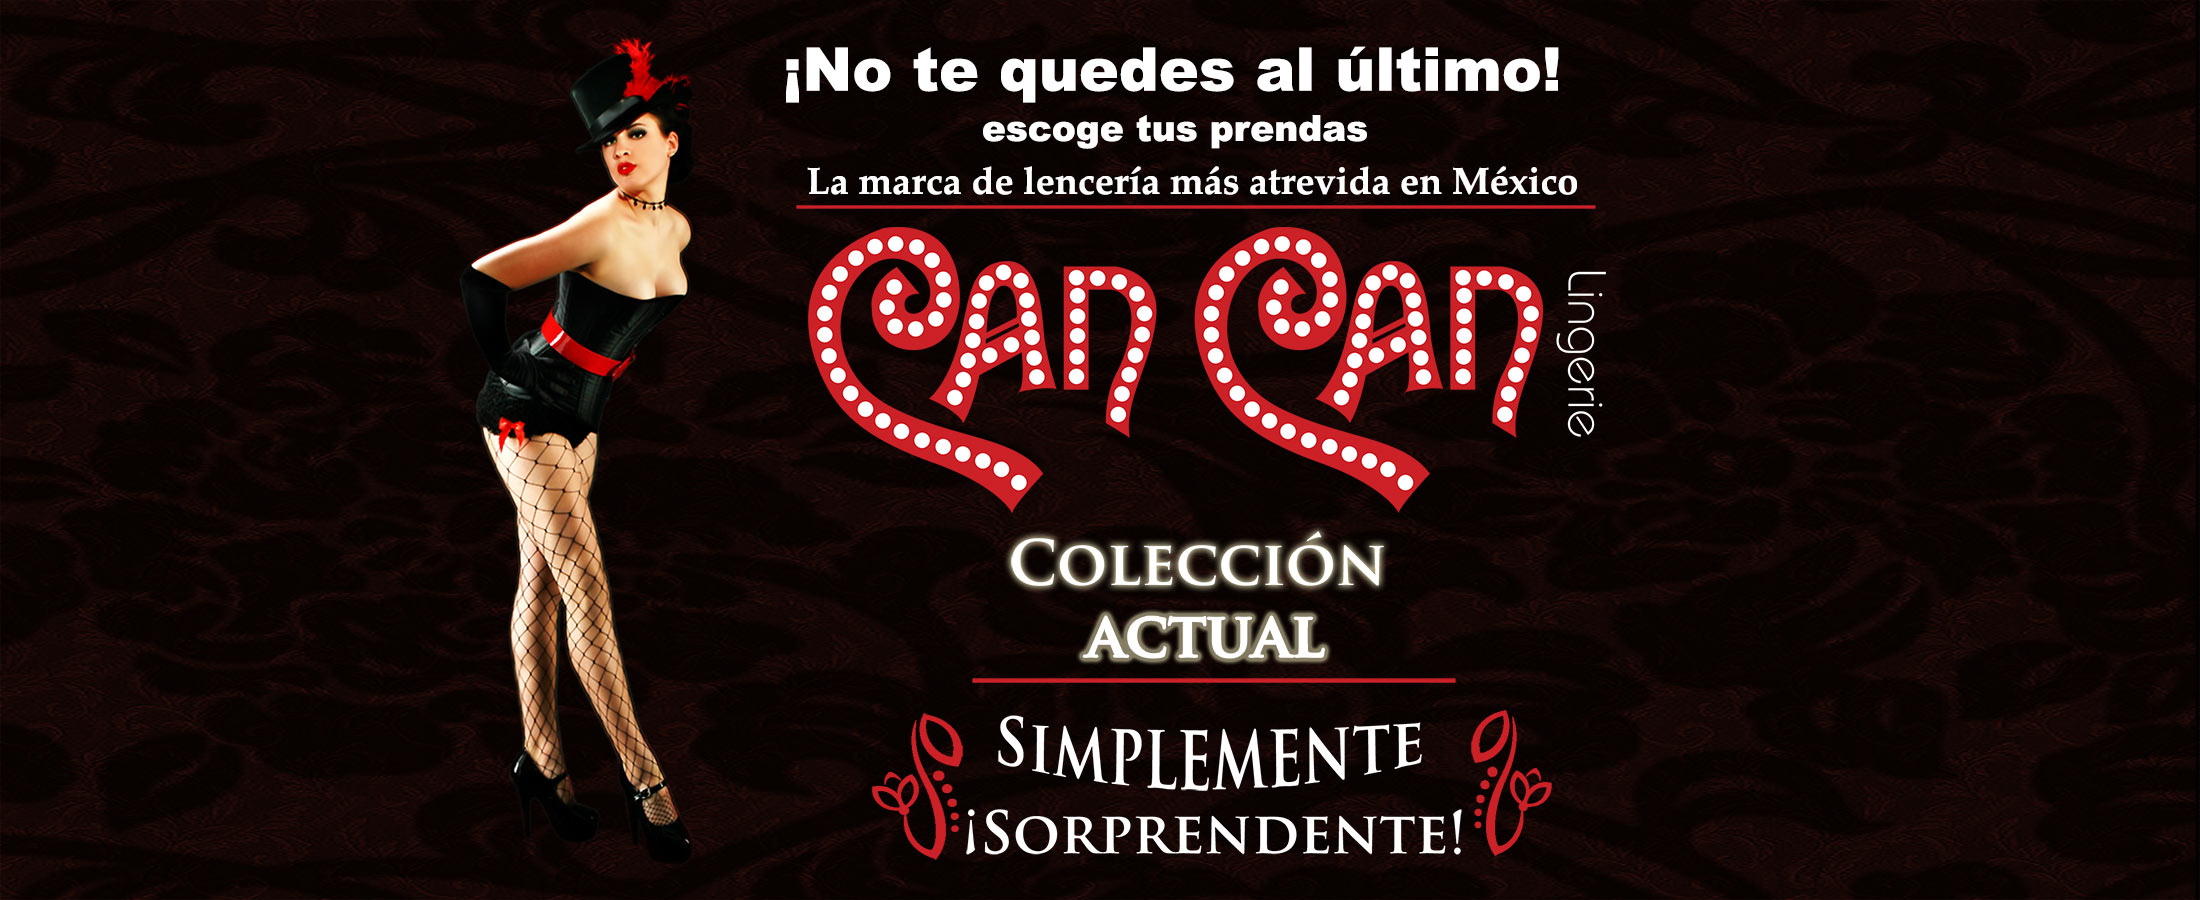 1429bb32fdb5 Can Can Lingerie – La marca de lencería más atrevida de México